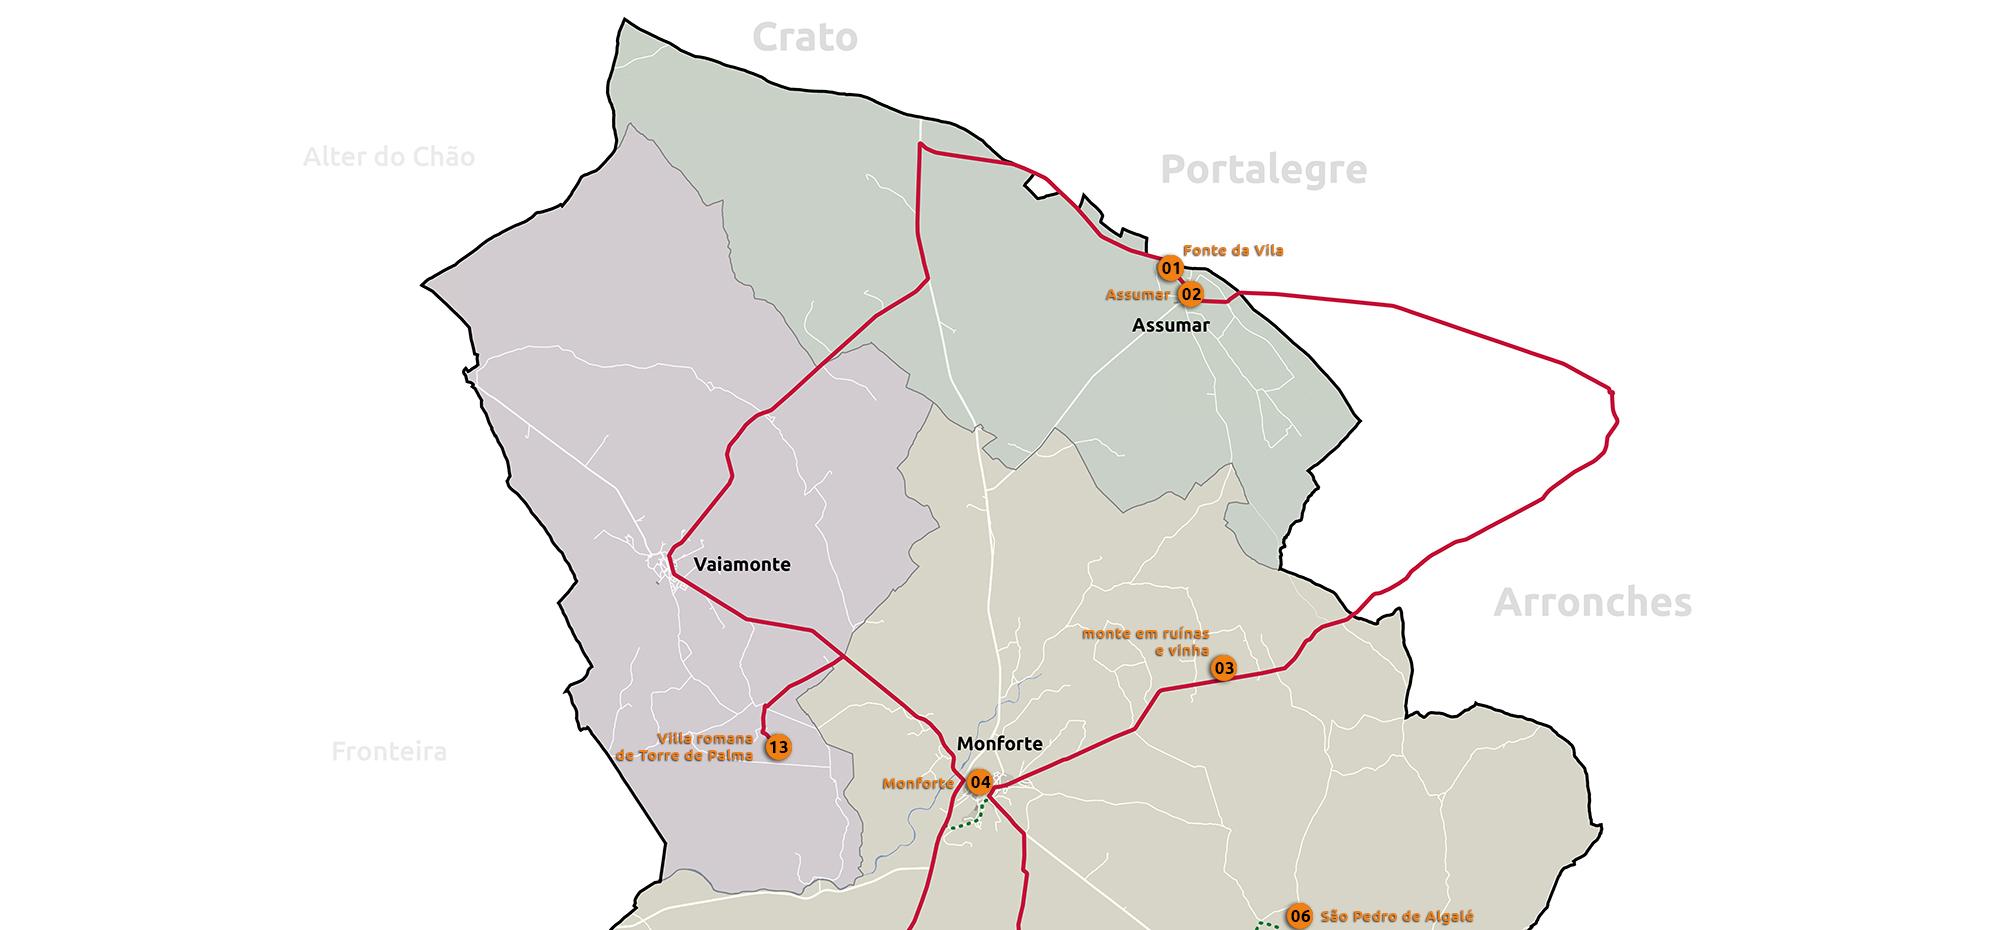 mapa_aumentado_2000x930_monforte_141015-01